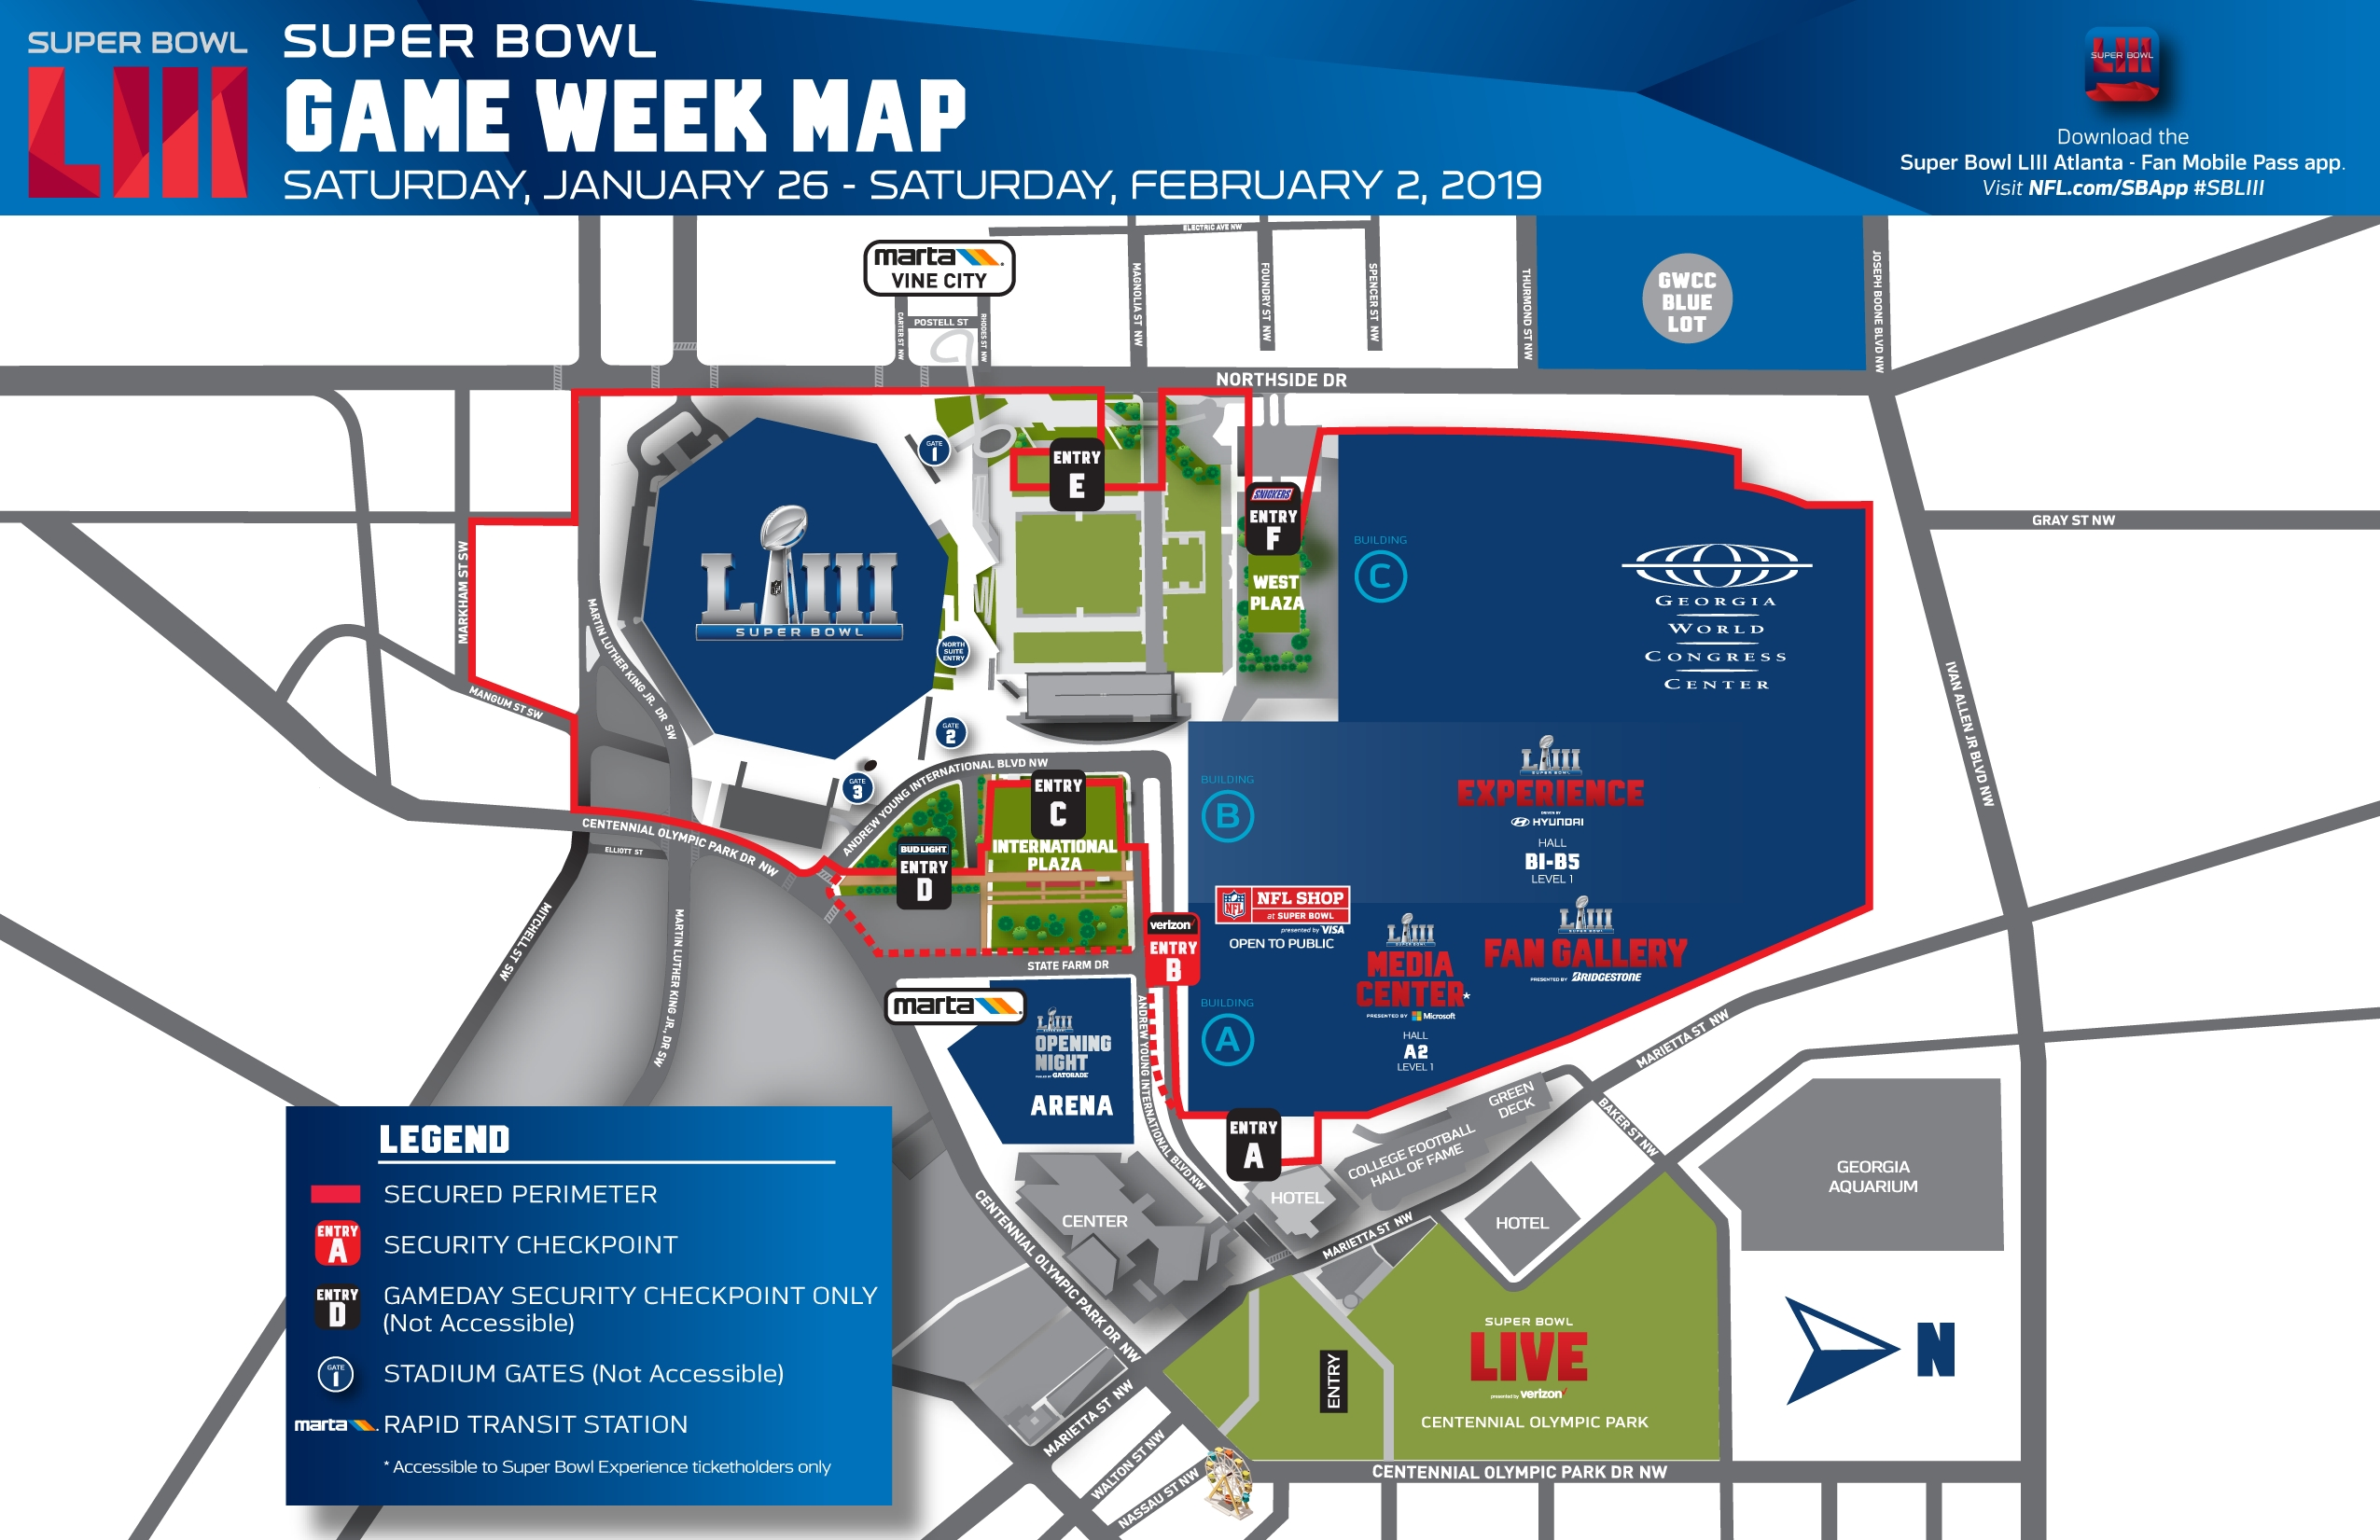 Super Bowl Hub - Mercedes Benz Stadium in Super Bowl Liii Map